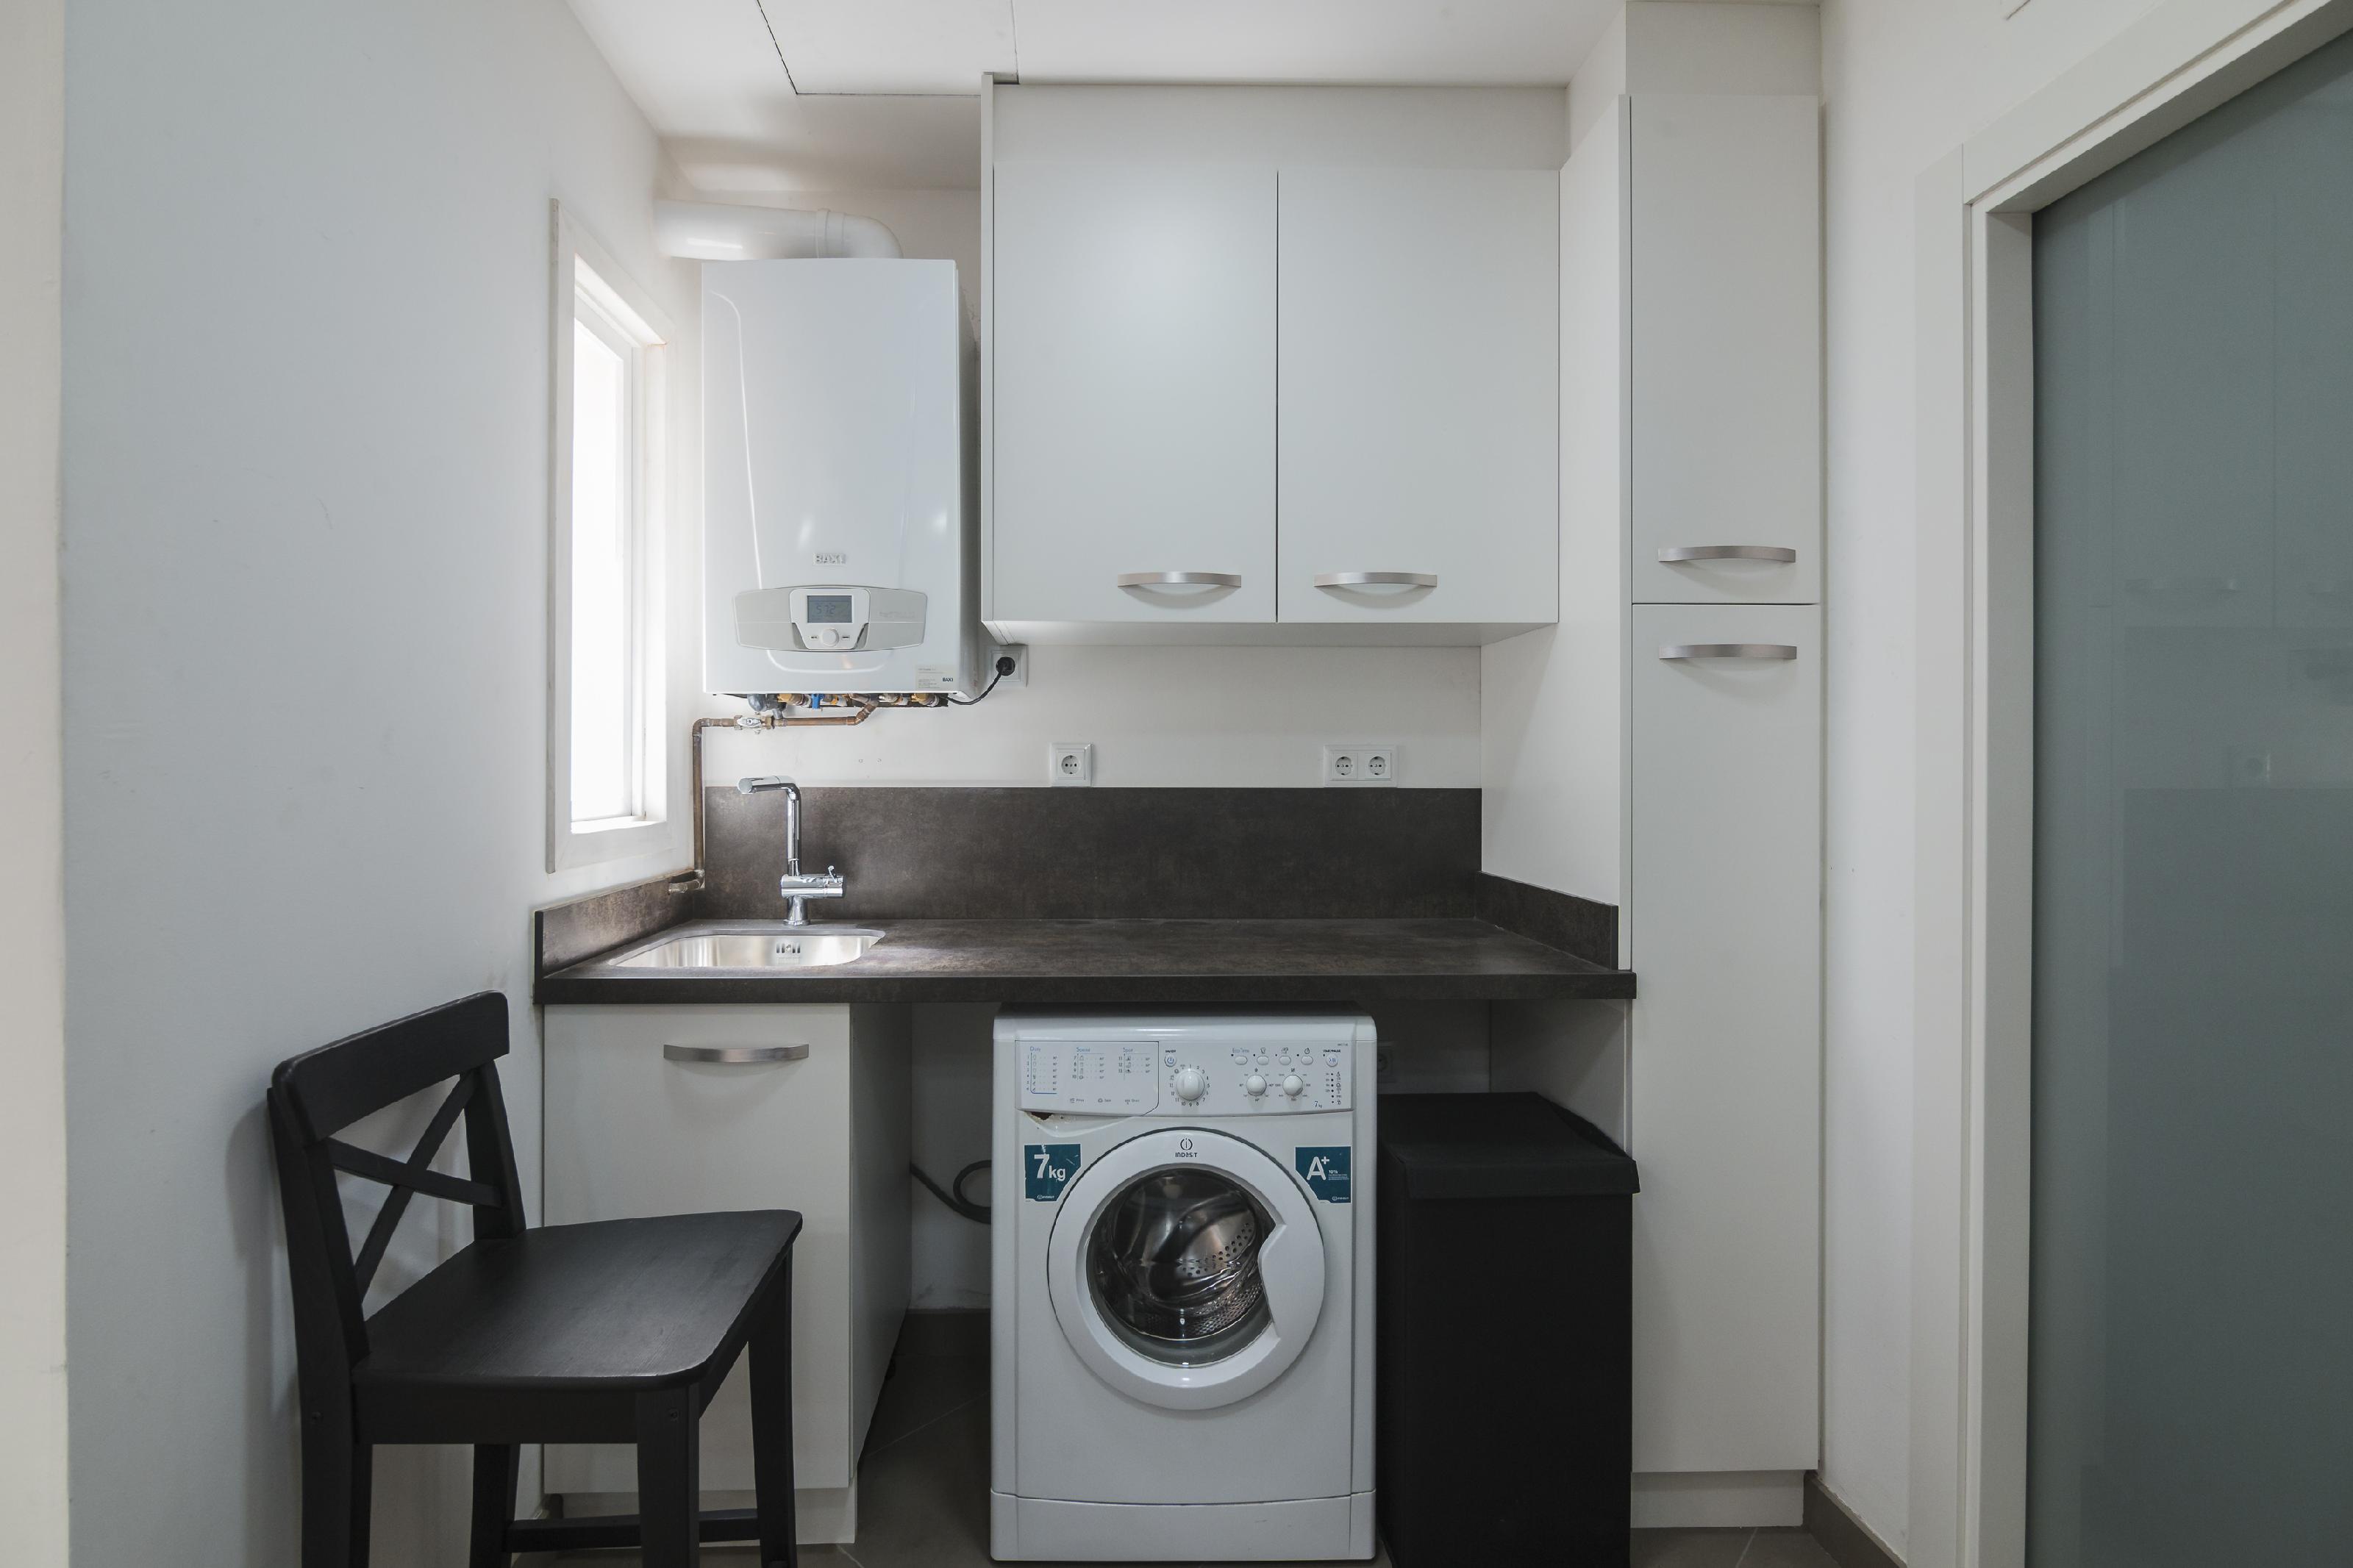 249856 Flat for sale in Sarrià-Sant Gervasi, Sant Gervasi-Galvany 19